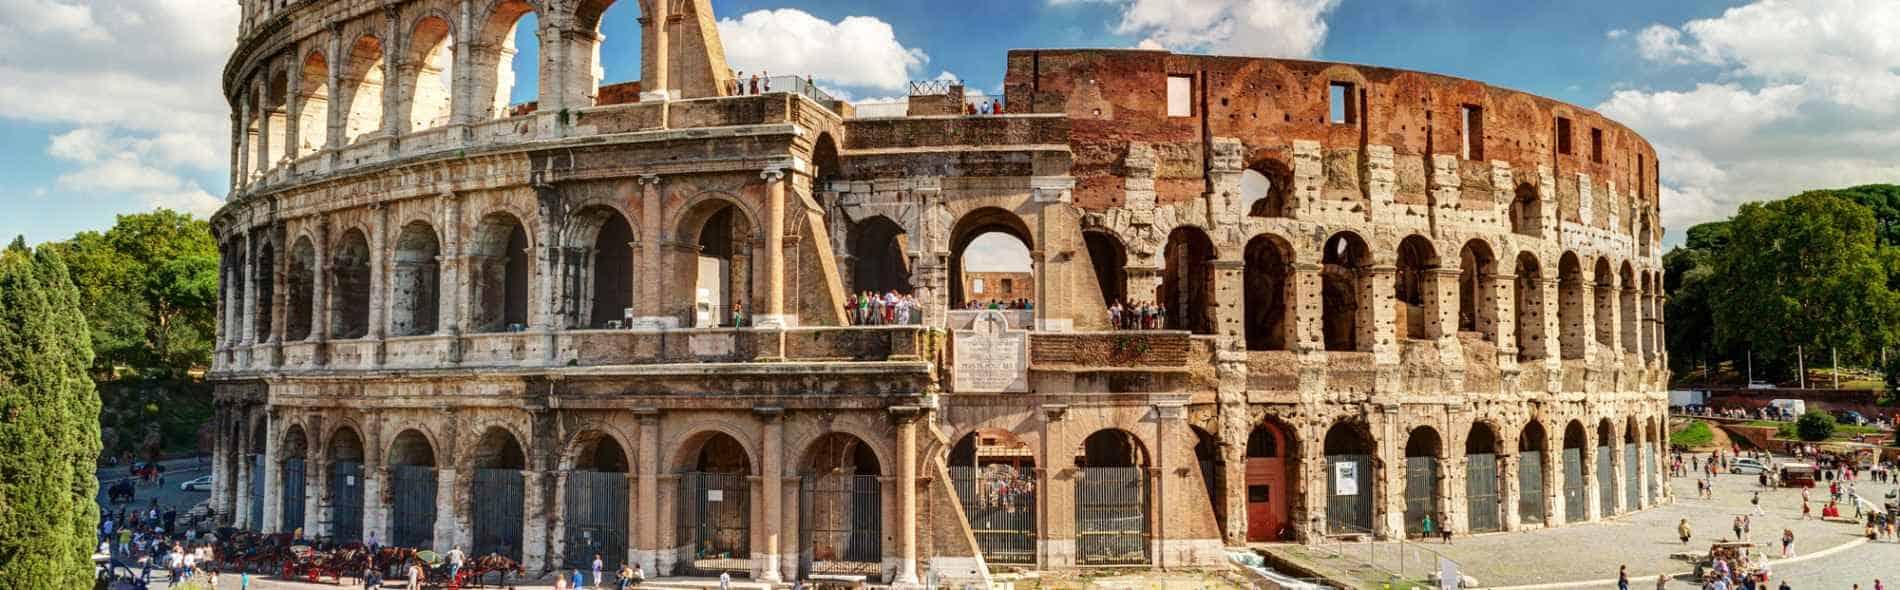 Colosseum, Palatine, Roman forum, private tour